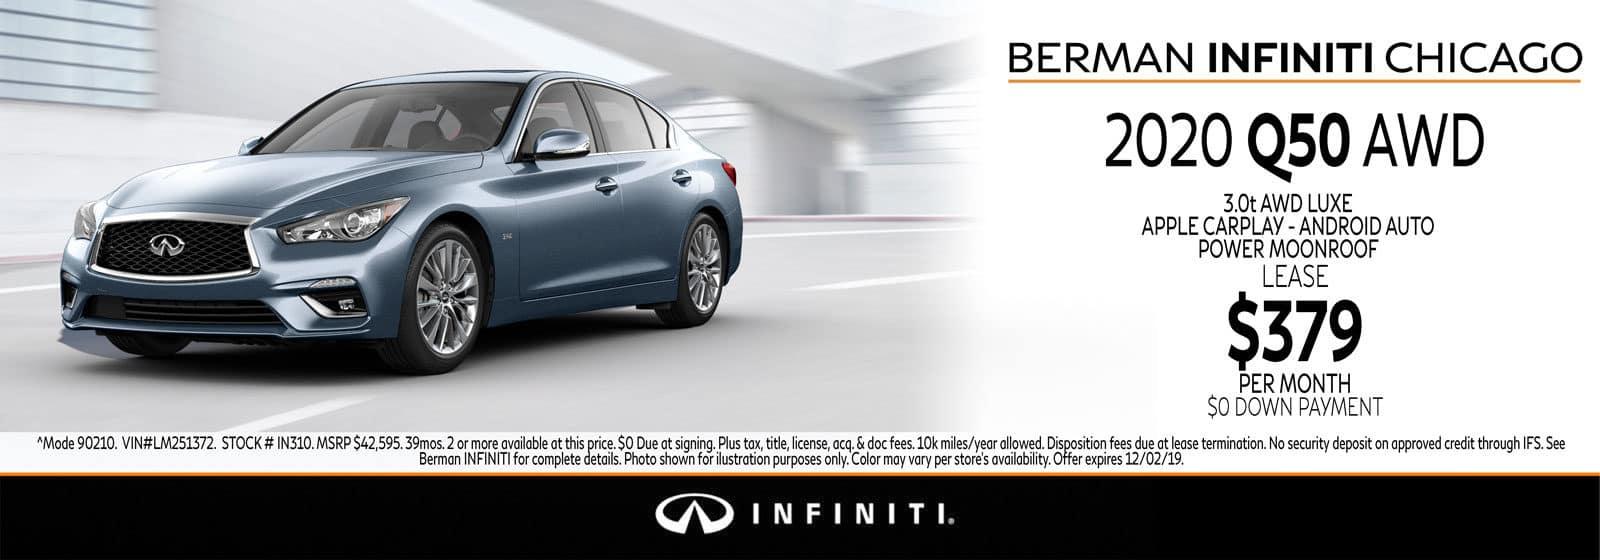 New 2020 INFINITI Q50 November offer at Berman INFINITI Chicago!